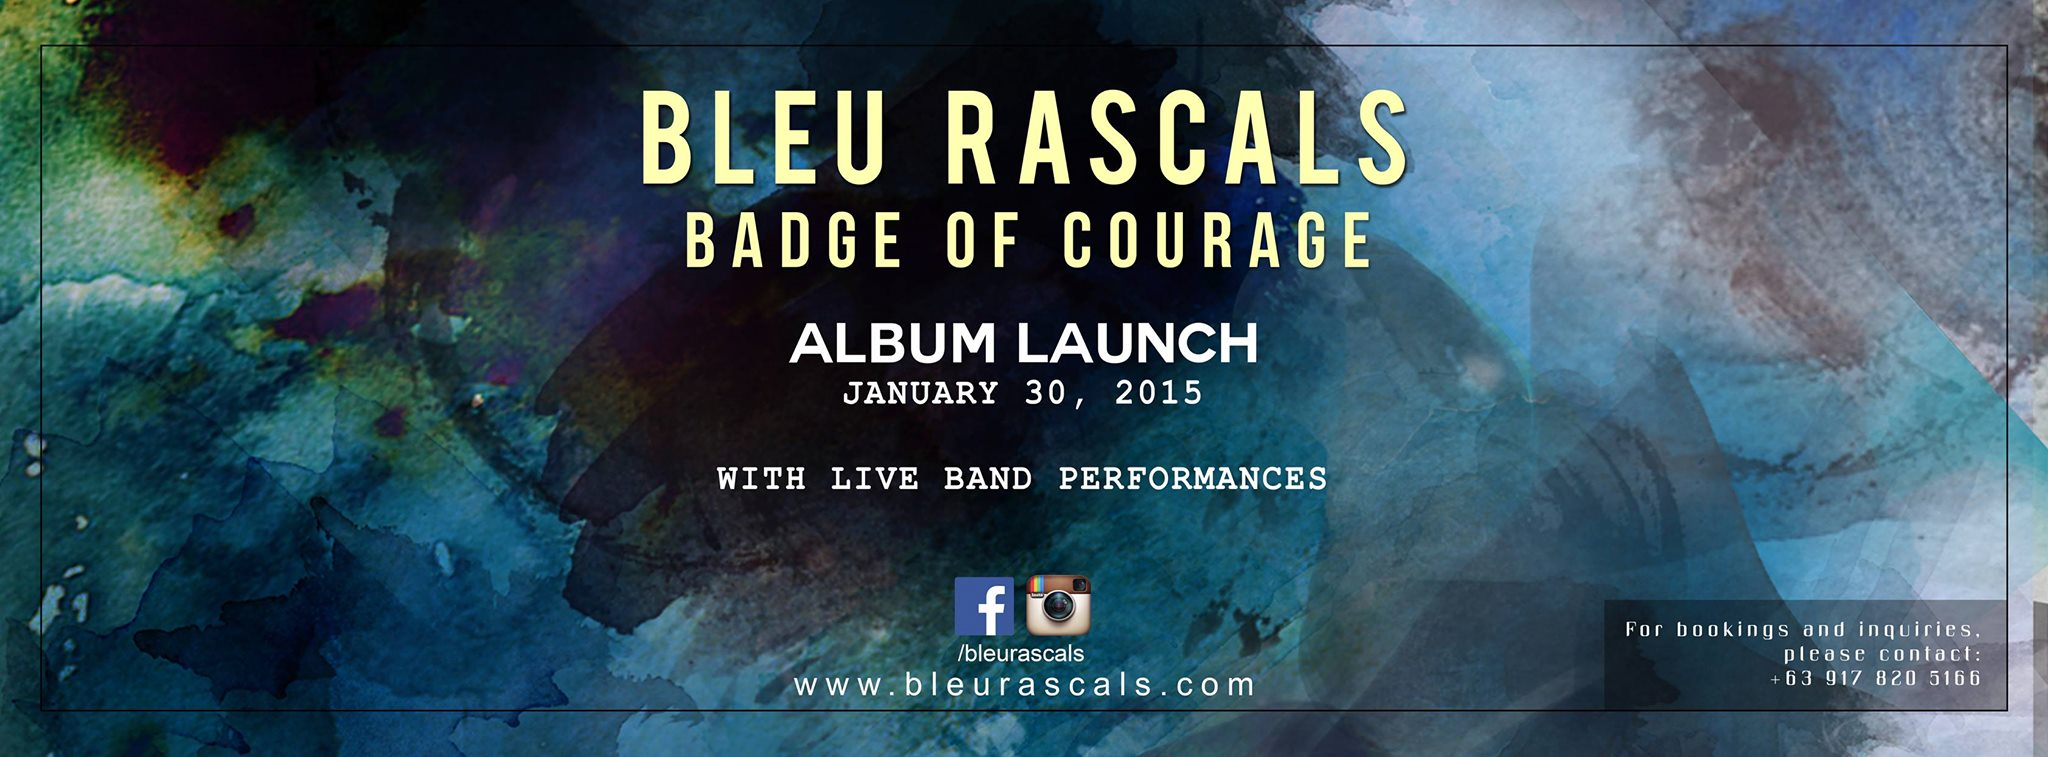 Bleu Rascals Album Launch Jan.30